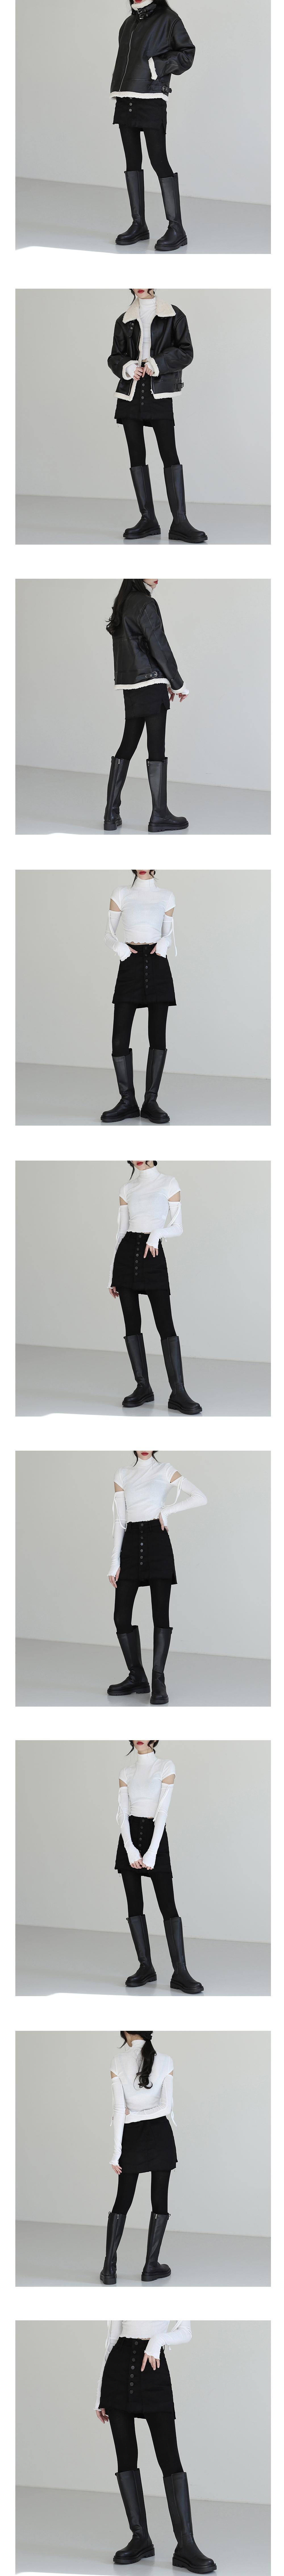 Cotton long stockings